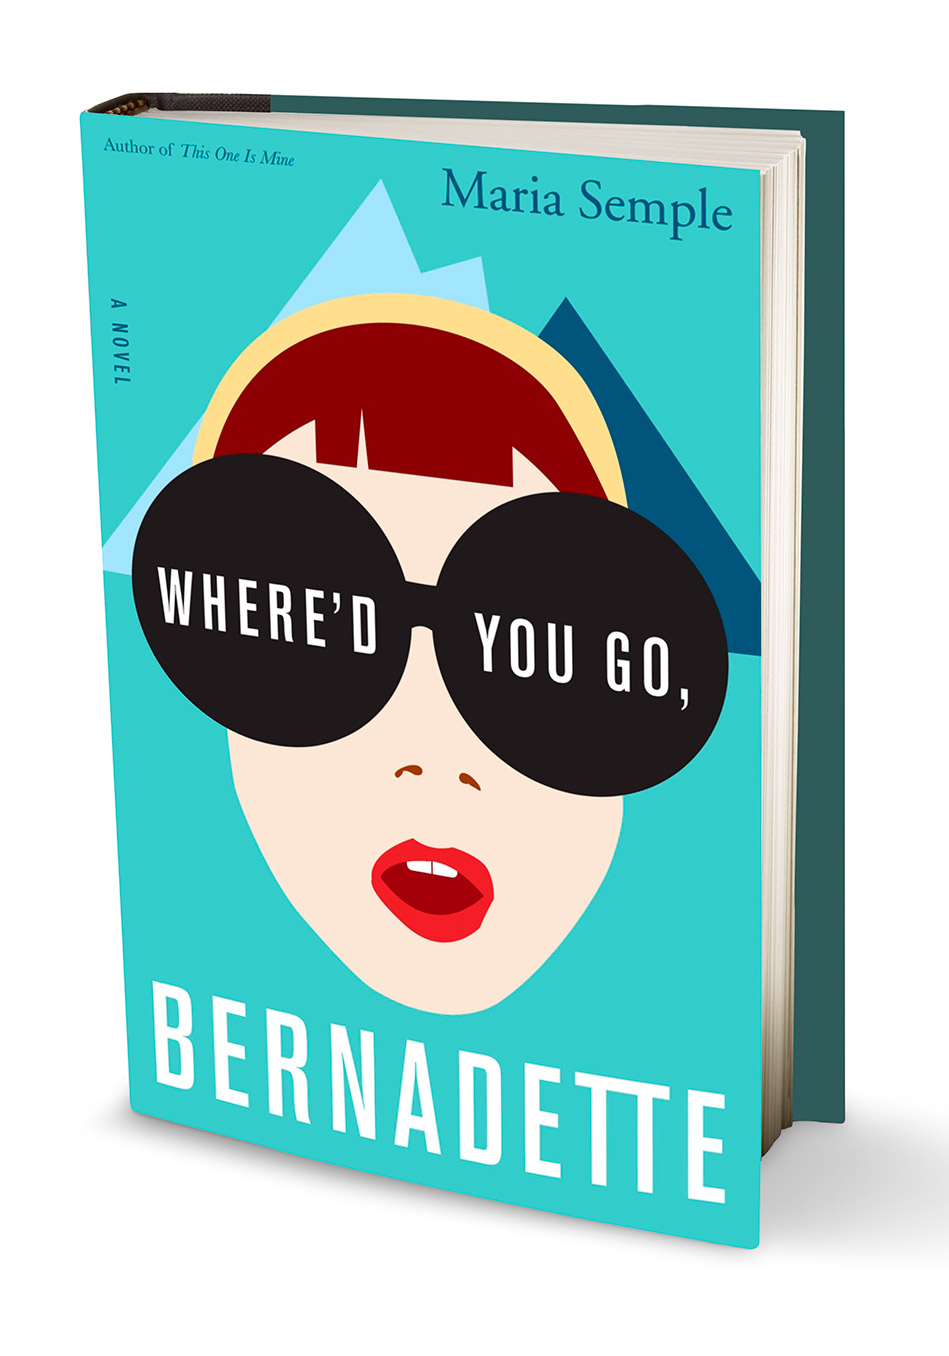 201504-book-bernadette-949x1356.jpg